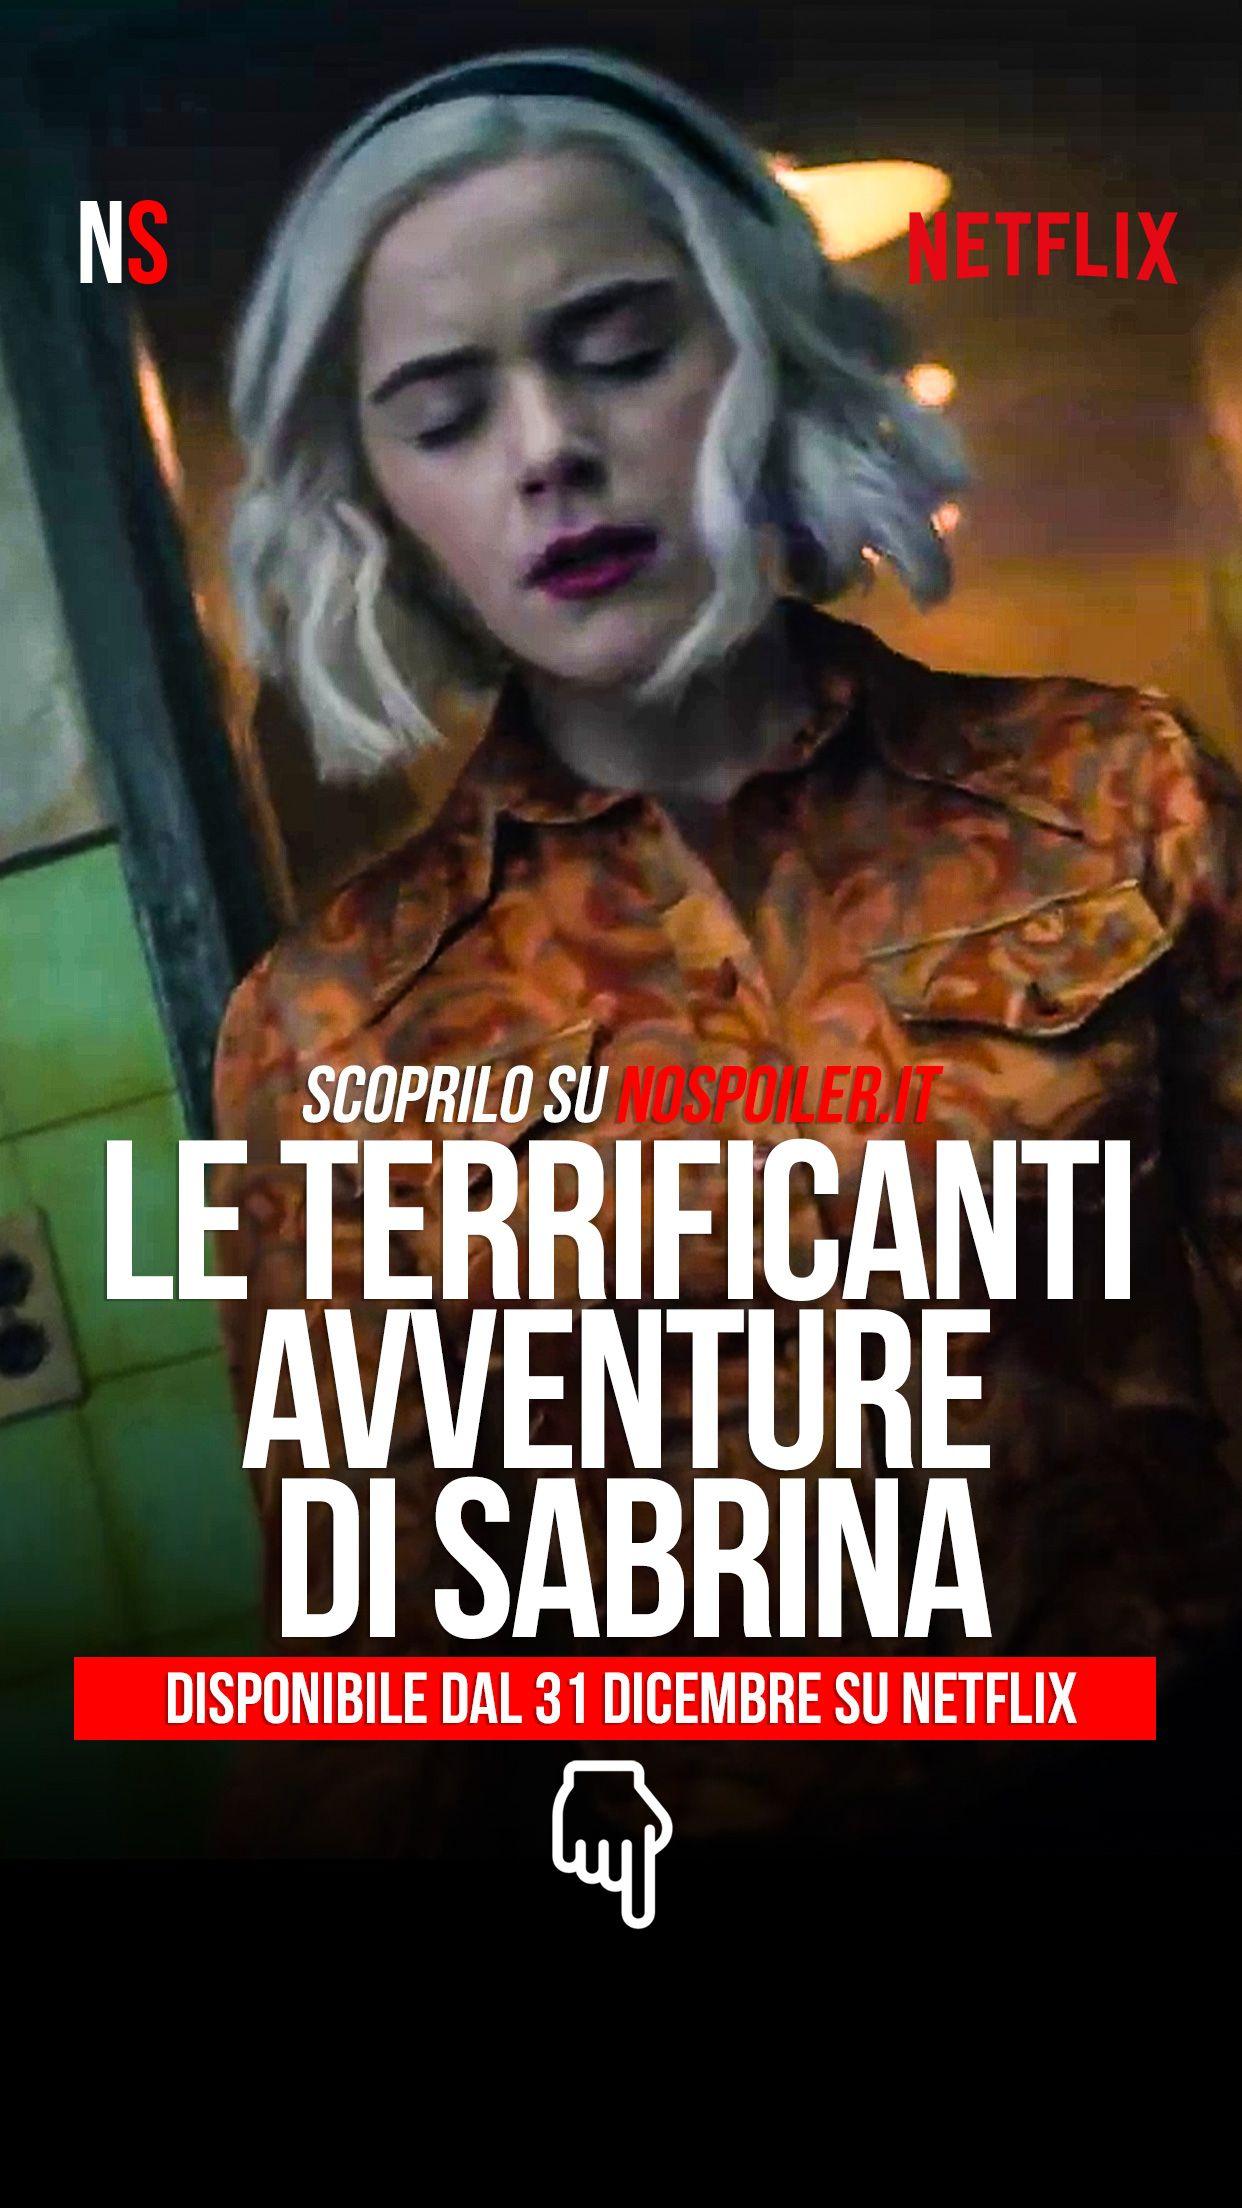 Le Terrificanti Avventure Di Sabrina Parte 4 Dal 31 Dicembre Su Netflix Netflix Avventura